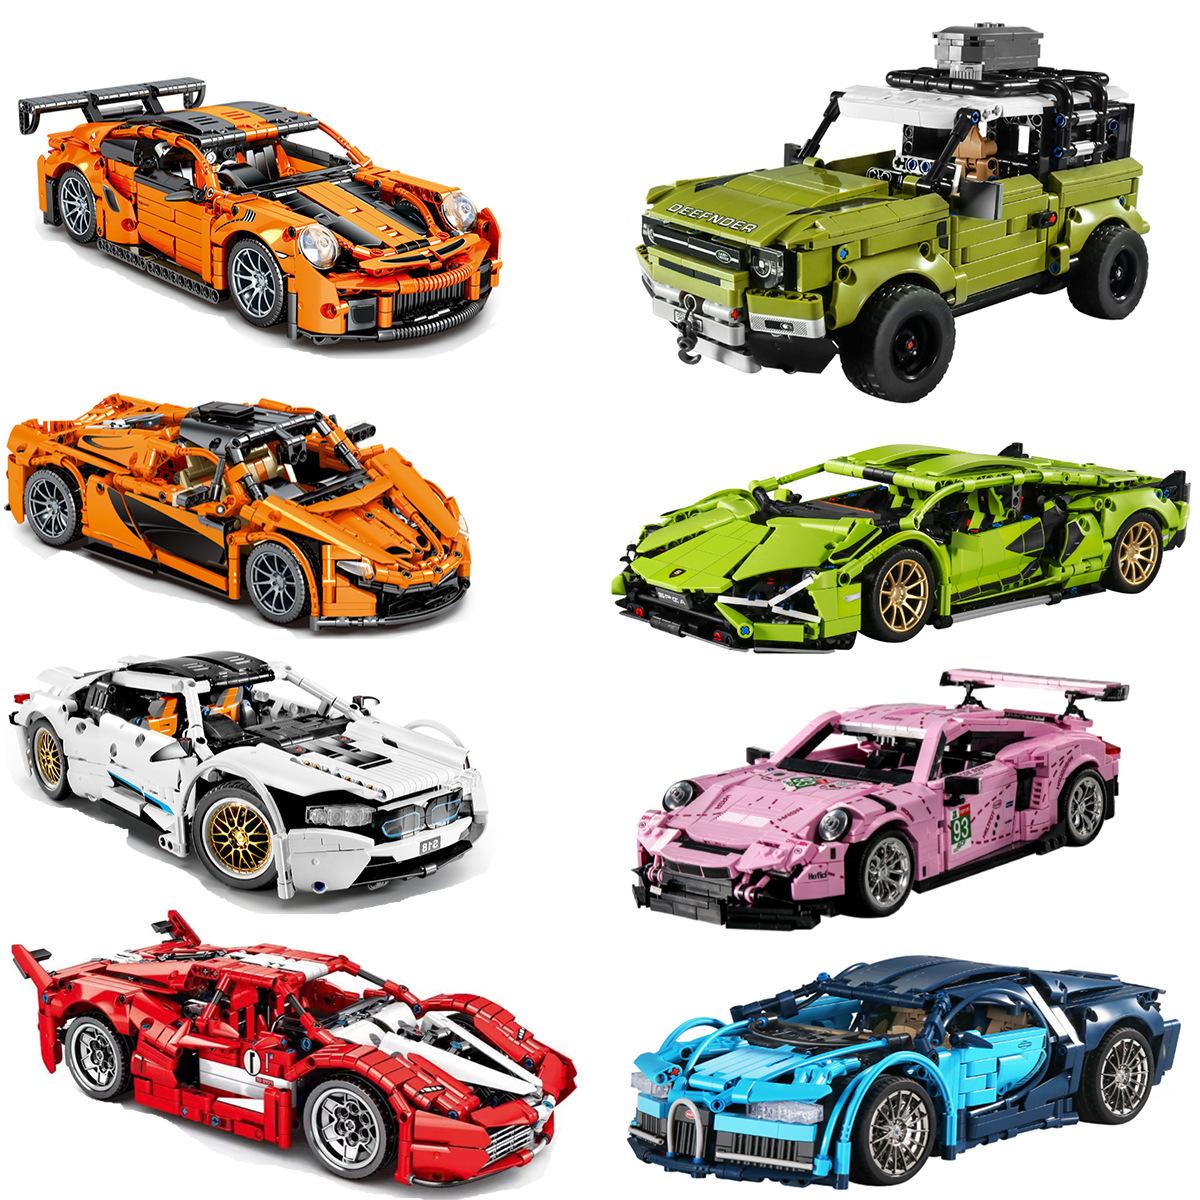 S牌车款系列车展完美大全拼装积木儿童玩具模型兼容乐高礼物DIY